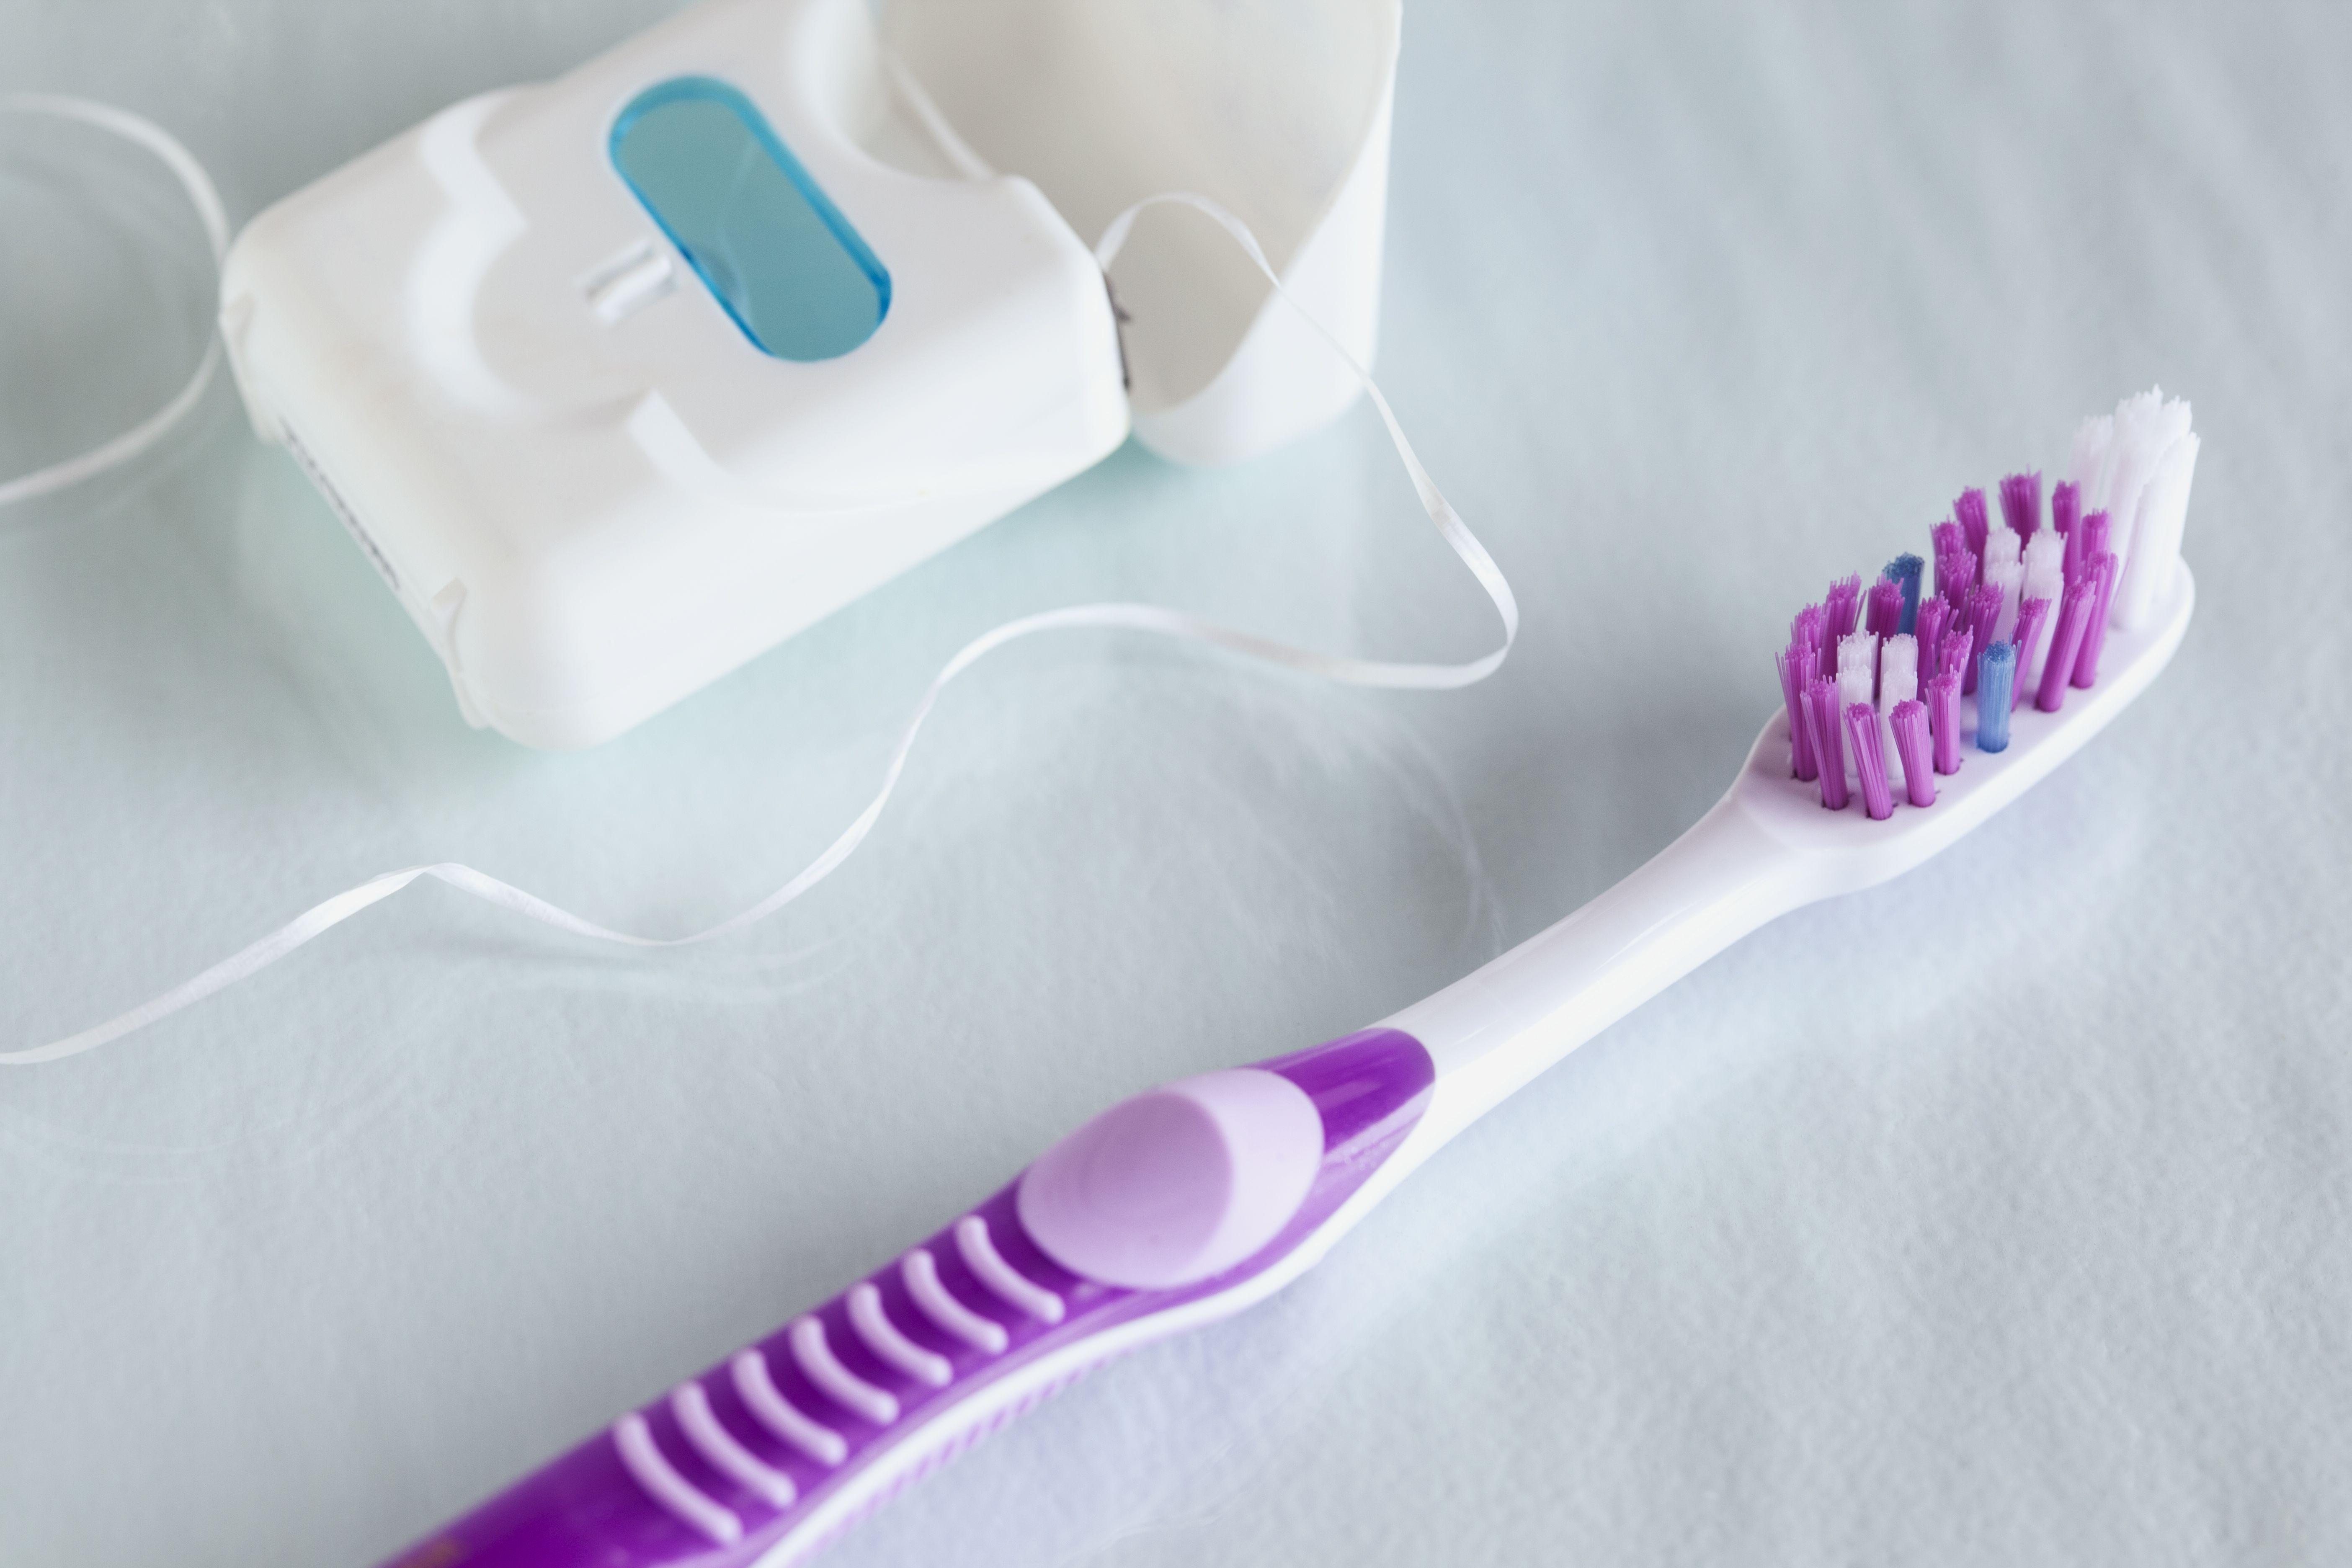 closeup of toothbrush and dental floss